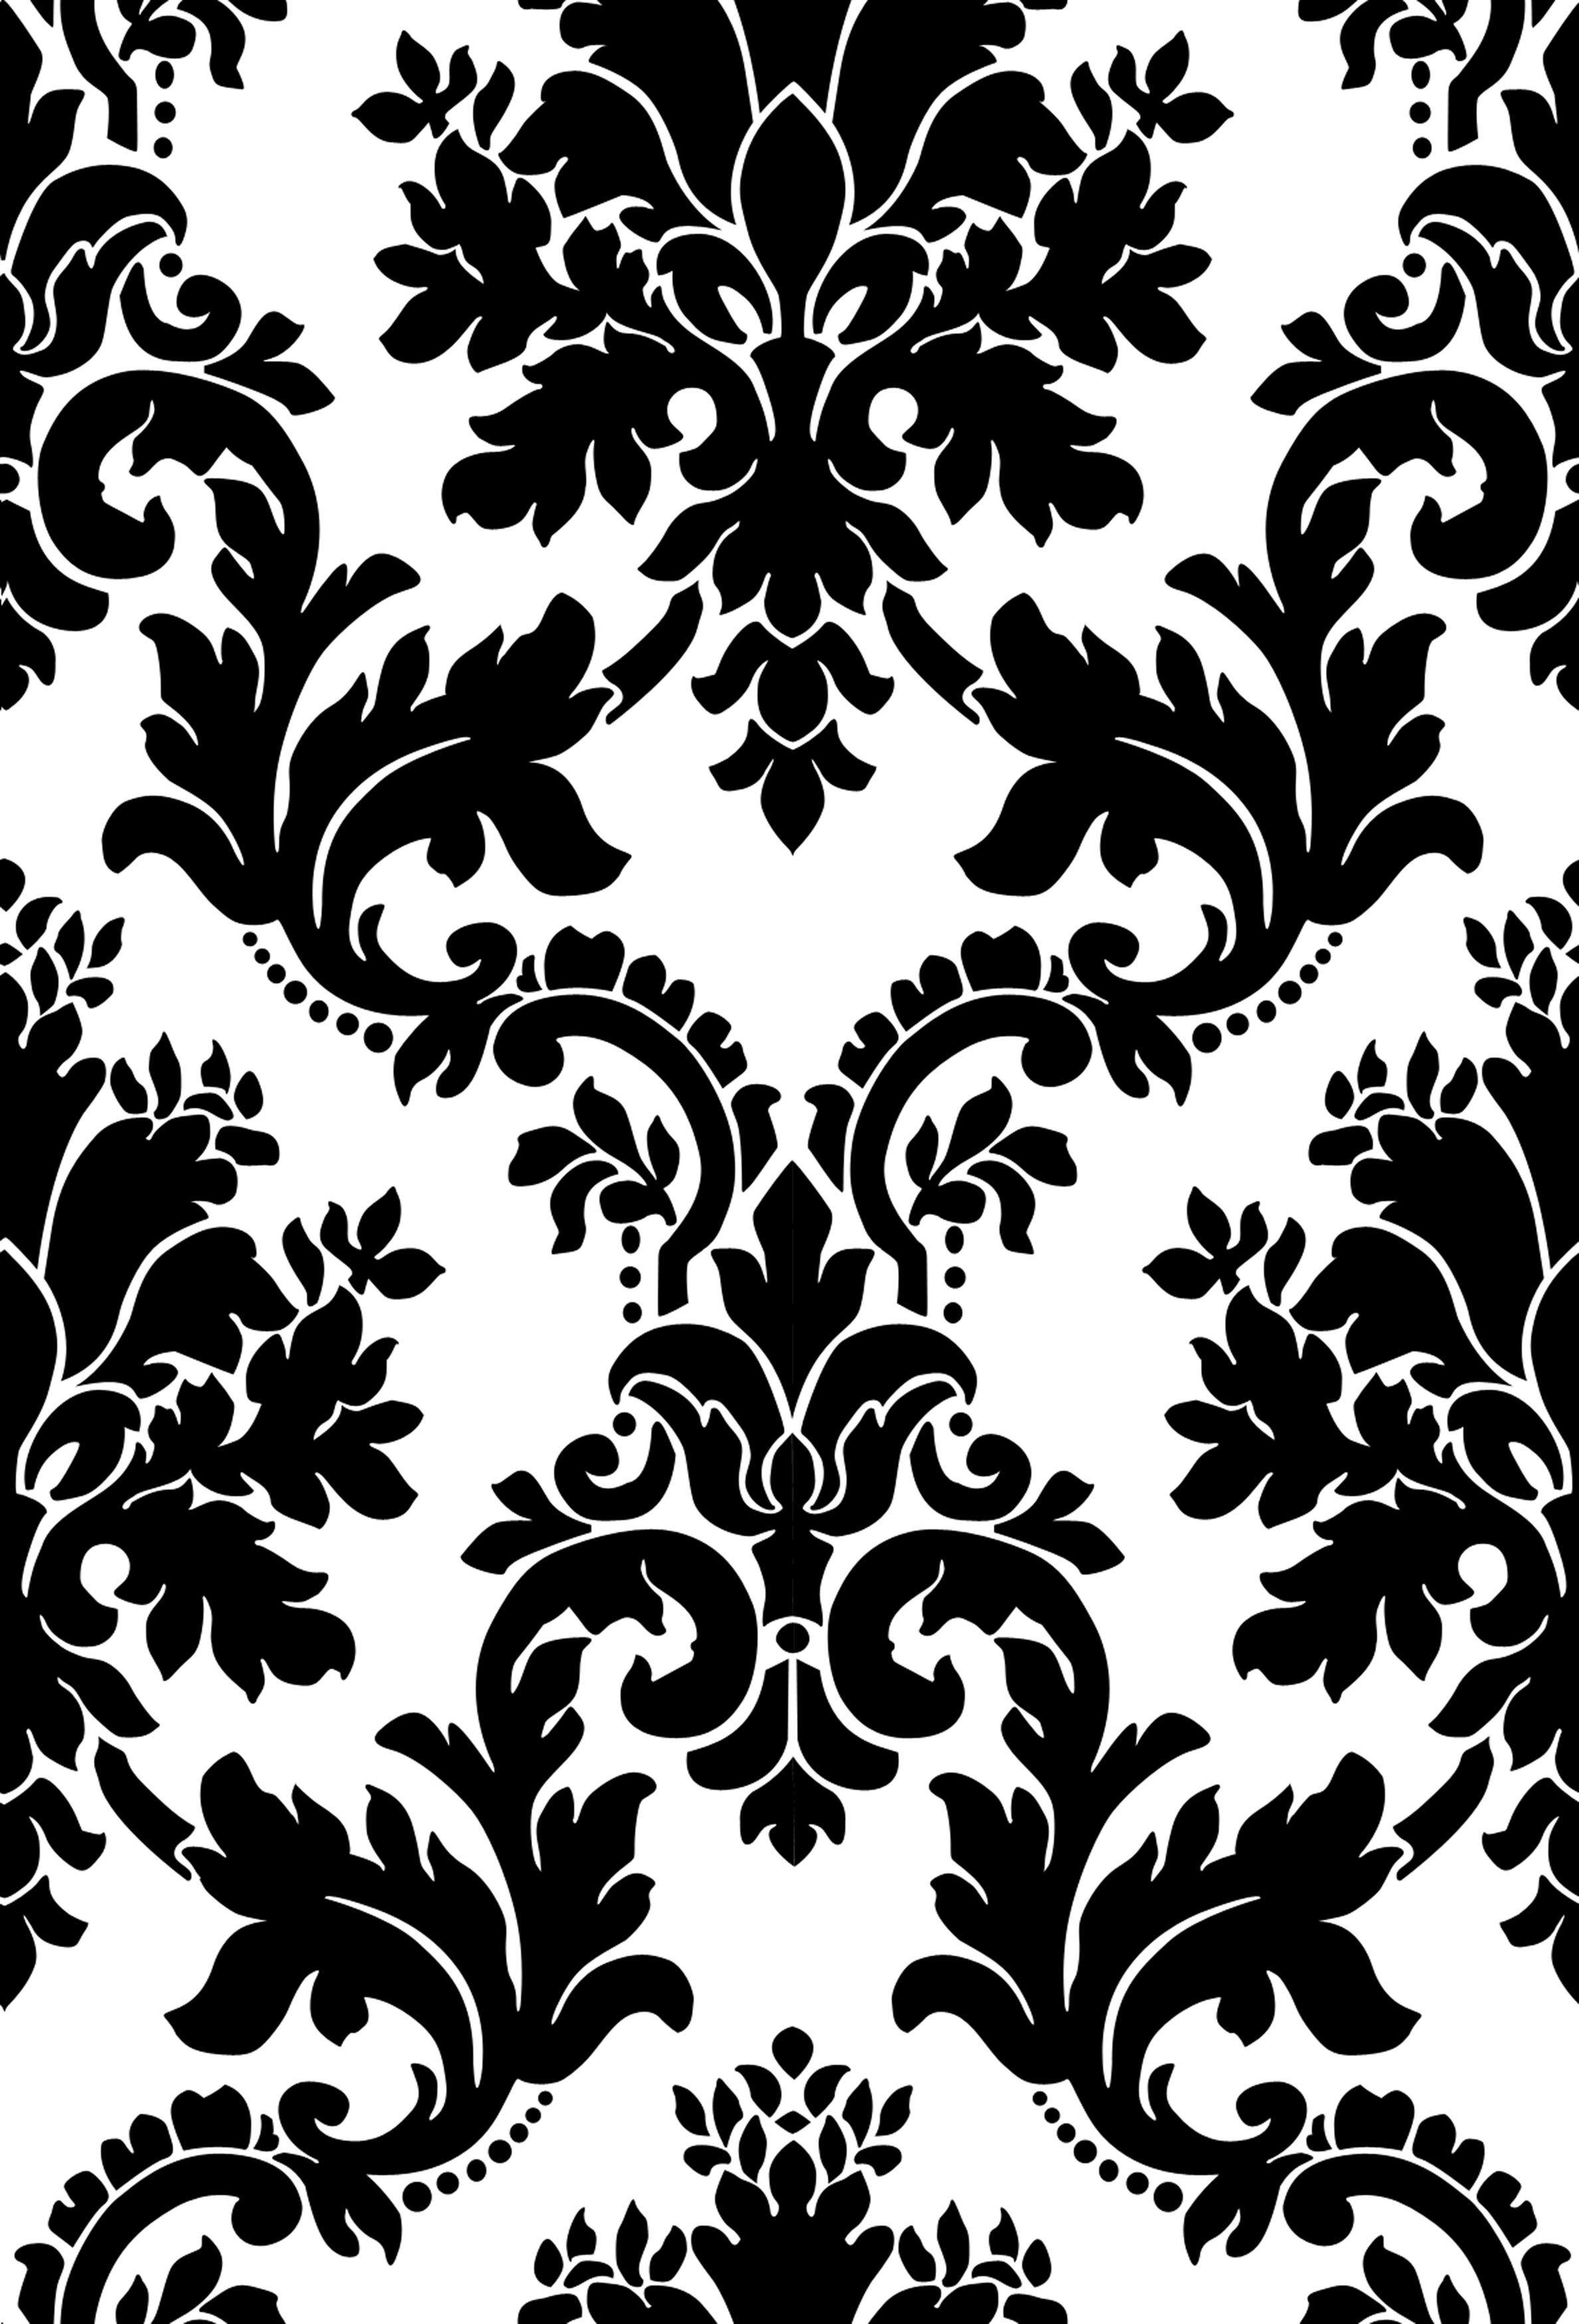 Image from http://newartcolorz.com/images/flock-wallpaper/kartandtinki1_flock-wallpaper_09.jpg.